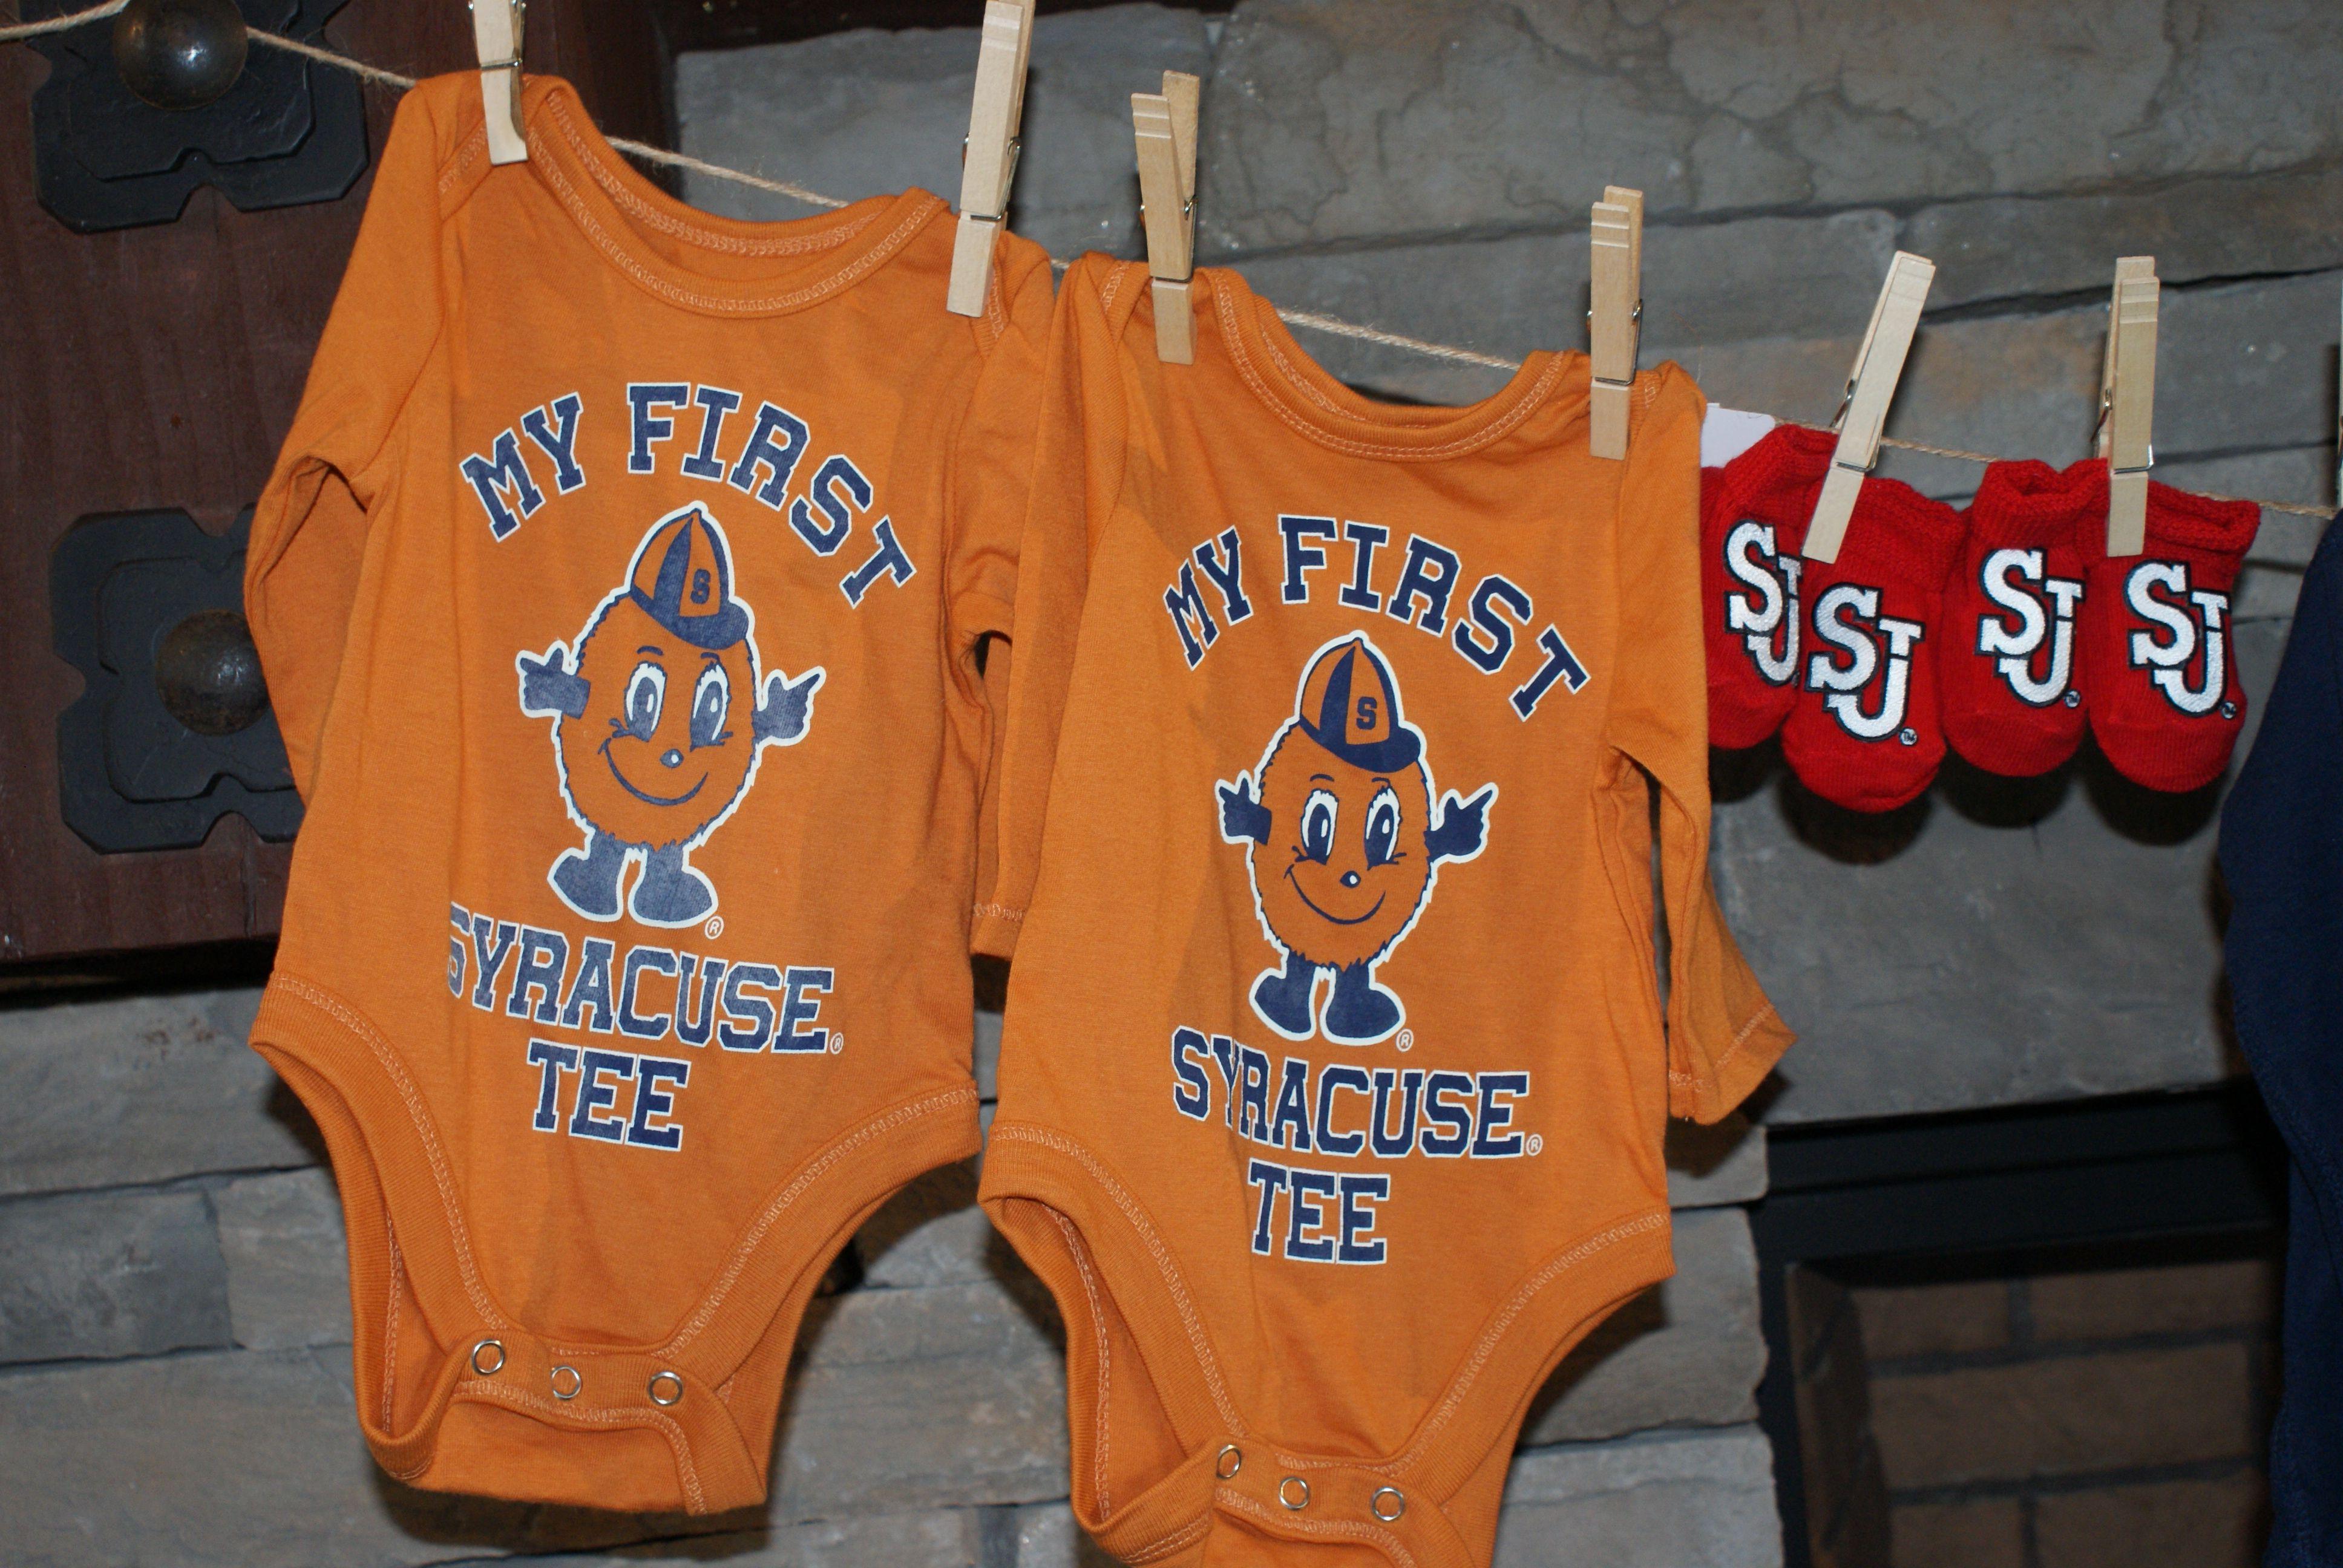 Big East Rivals Stéphane Rasselet John s University vs Syracuse